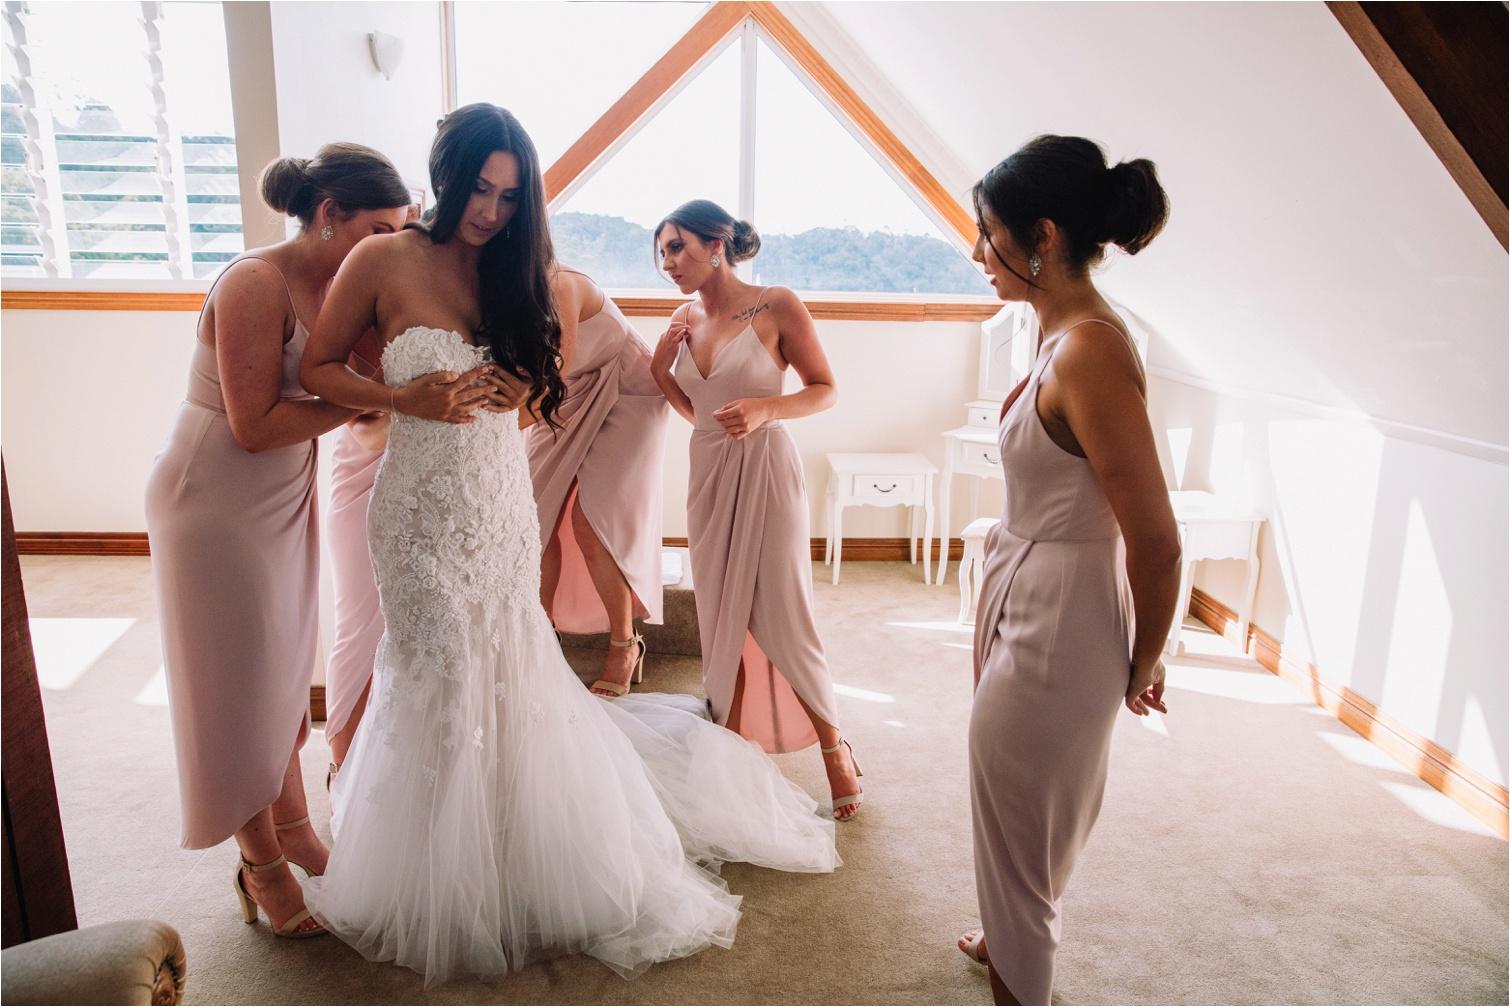 Maleny Manor Wedding Photography - Gold Coast Wedding Photographer_0016.jpg